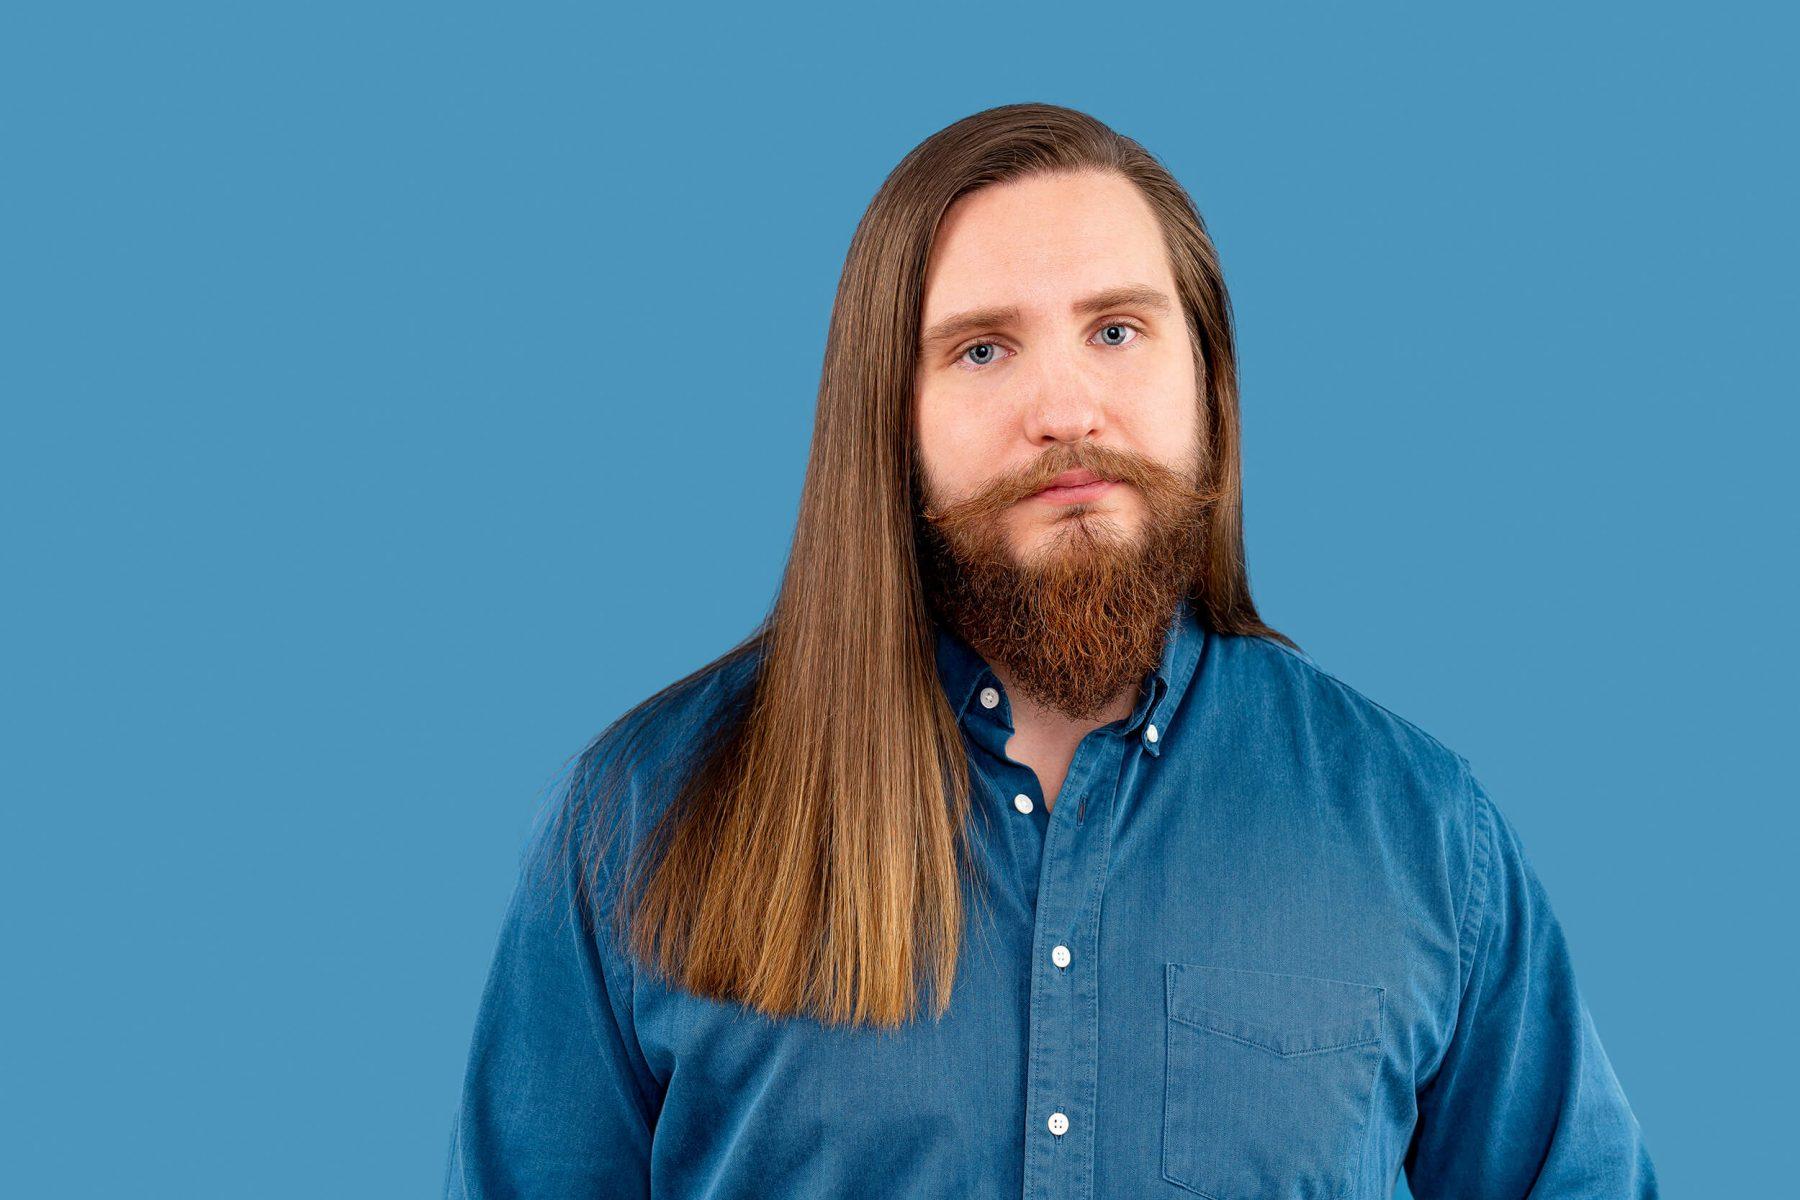 Sad man in studio. Blue background. Sad eyes.